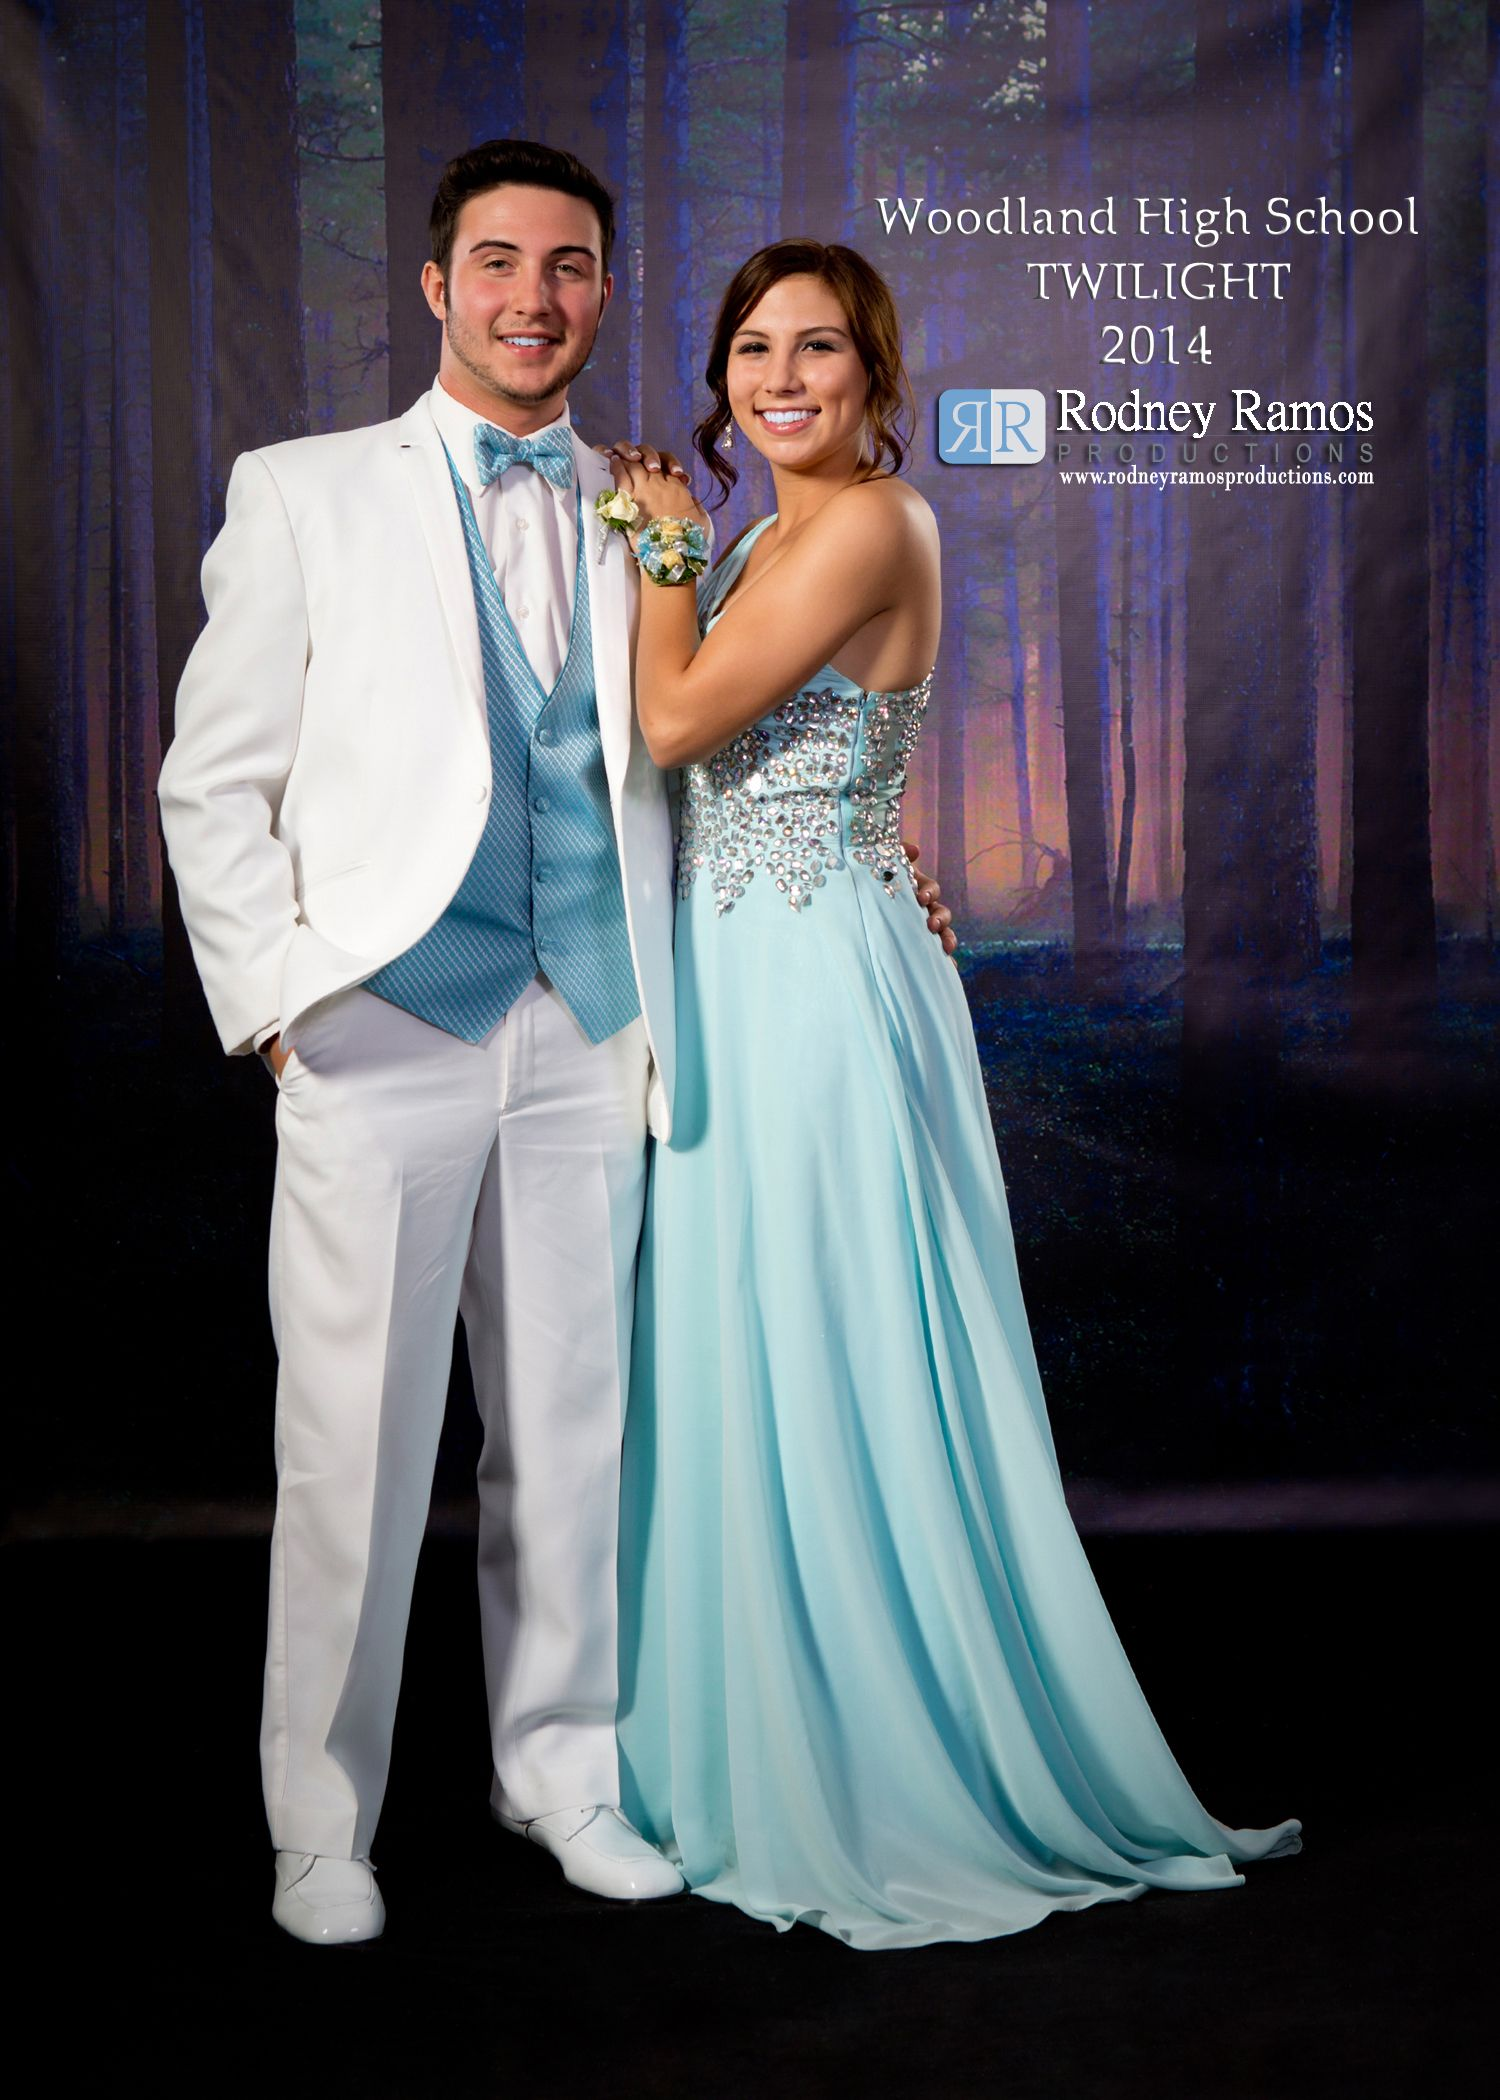 Woodland High School 2014 Twilight Prom Photo Styling By Rodney Ramos Productions C 2014 Rodneyramosproductions Rodneyramos Whs Prom Photos Prom Prom Dresses [ 2100 x 1500 Pixel ]